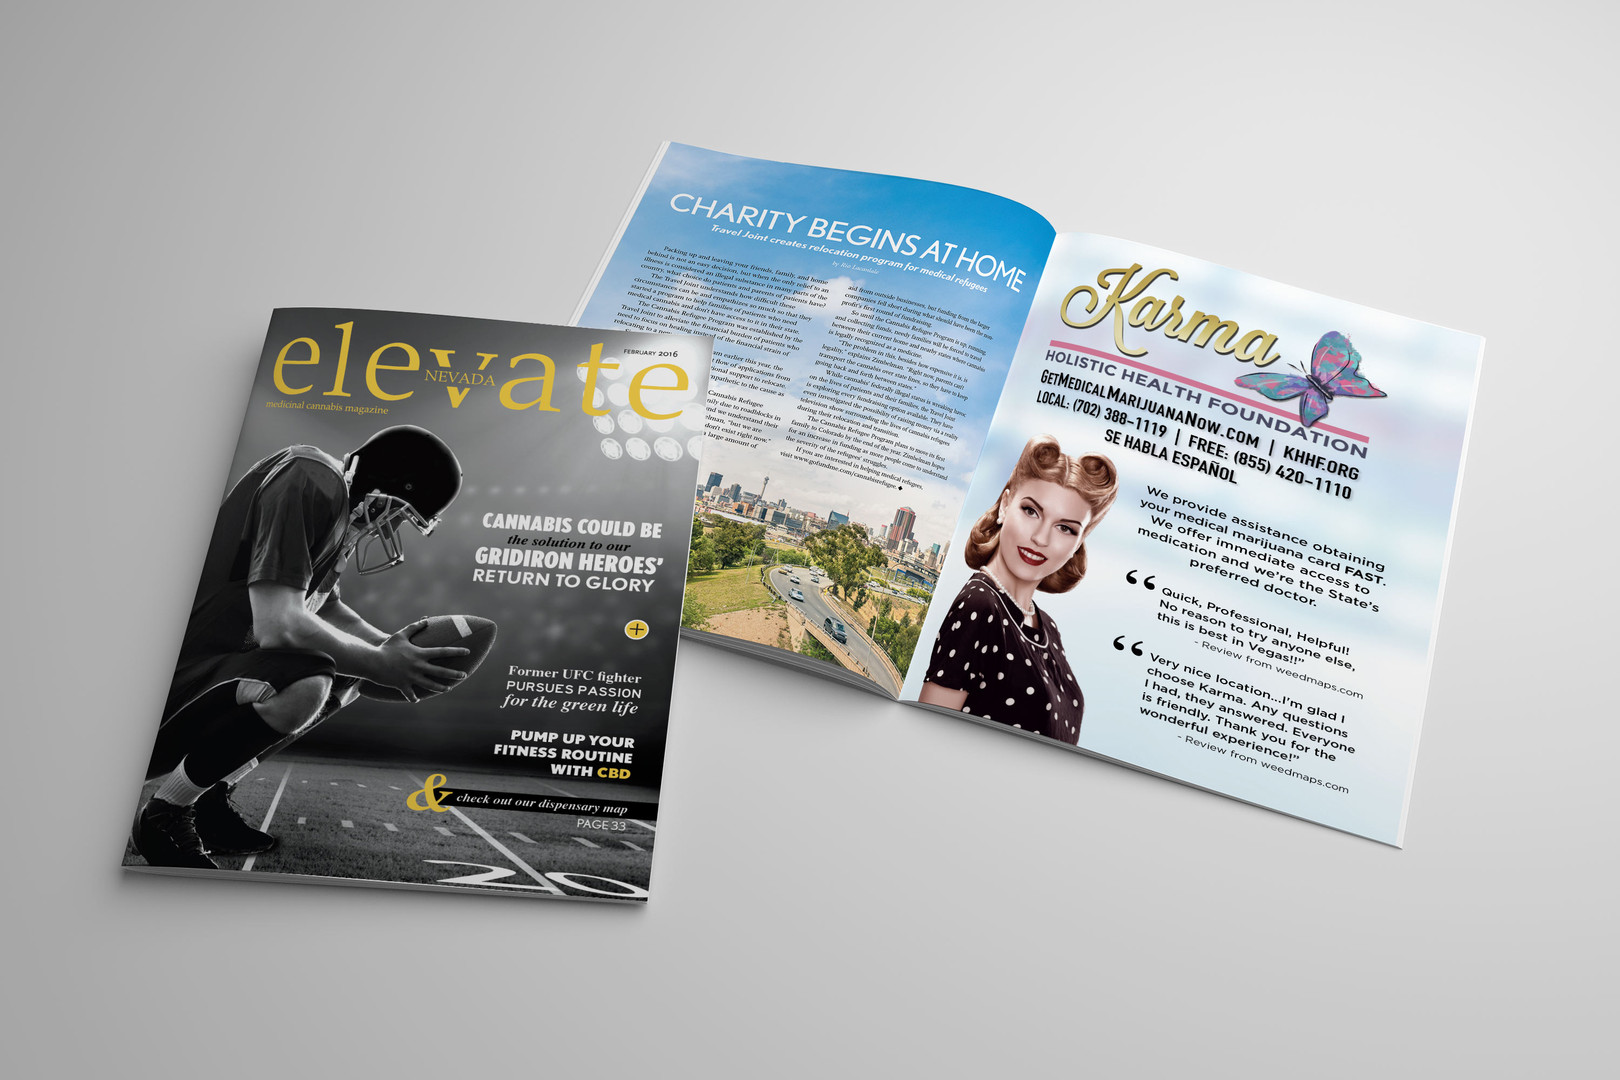 1-Elevate-Alt-Cover-10-SFW.jpg